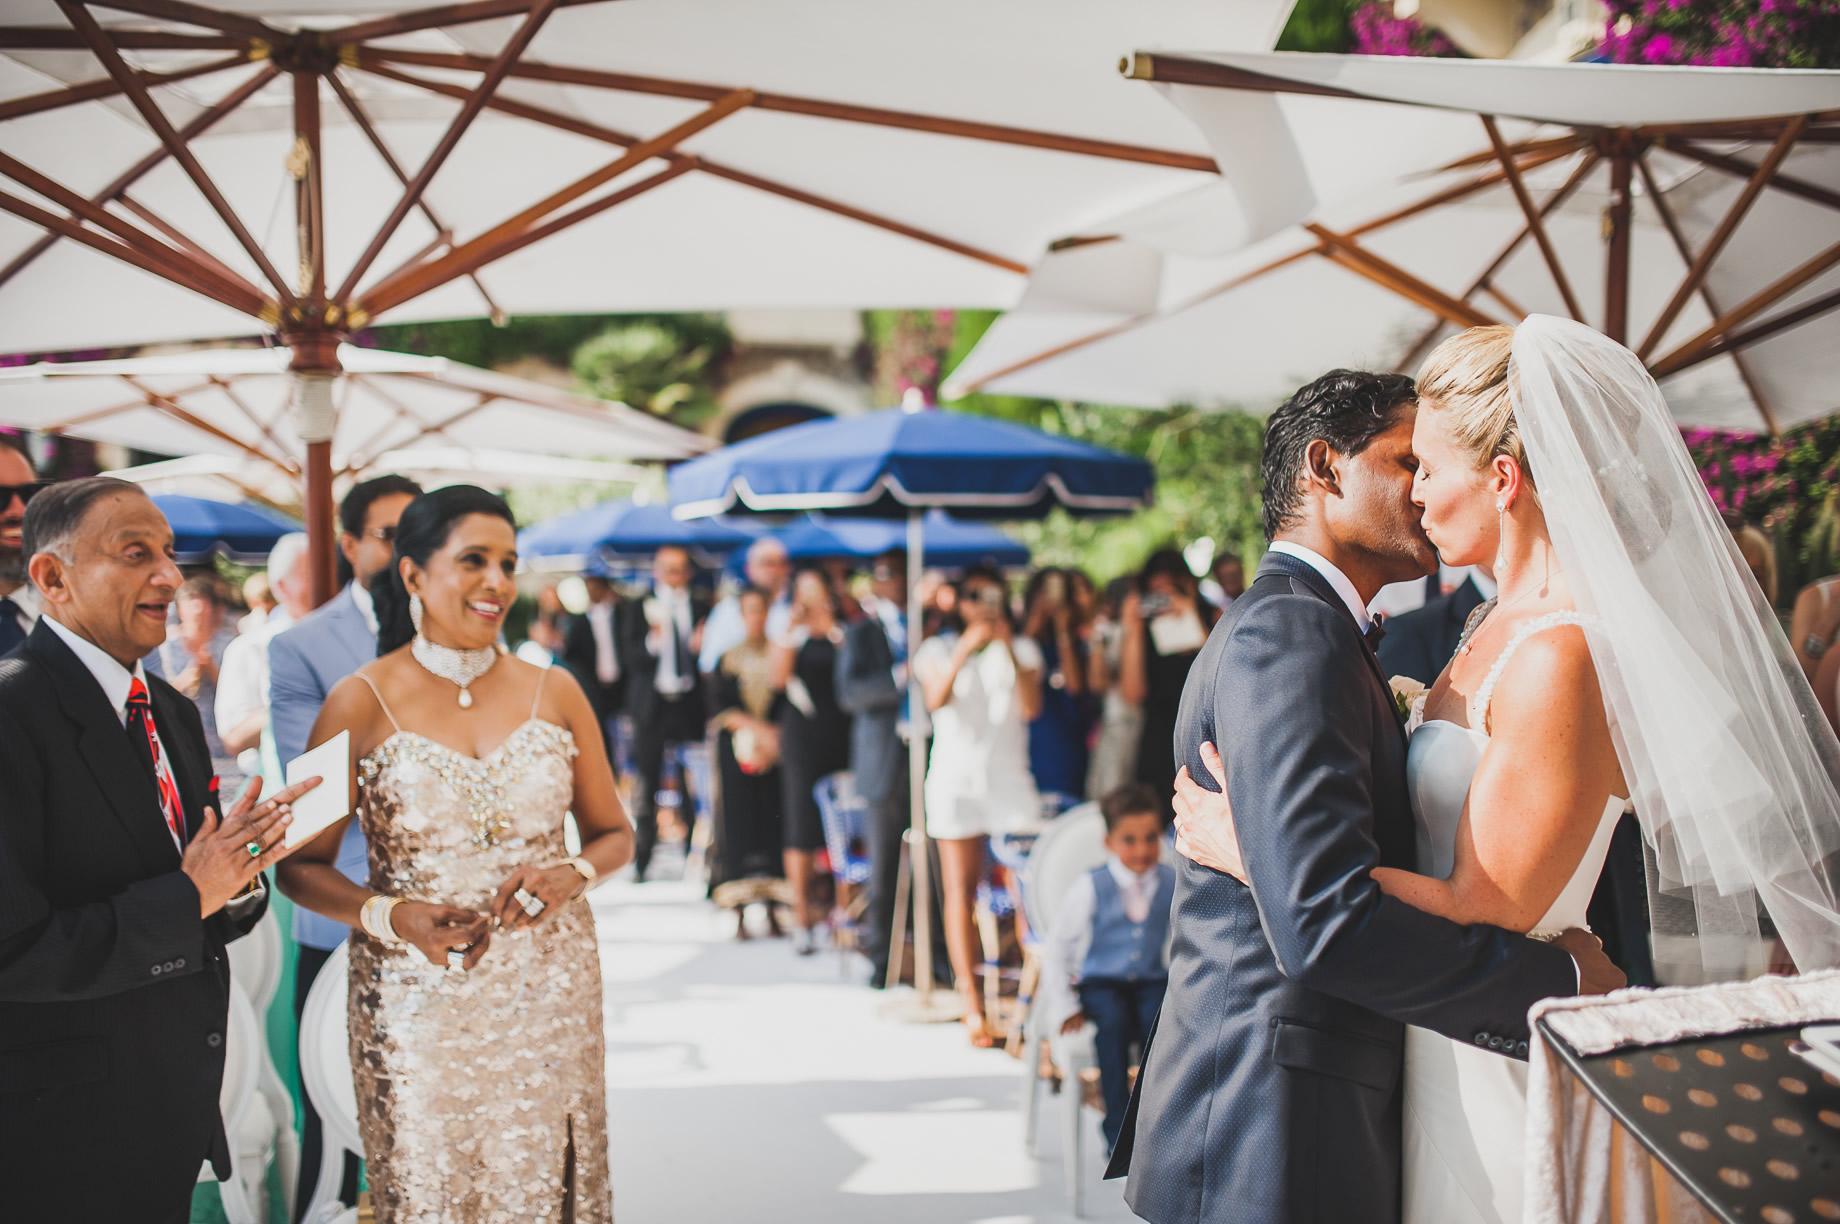 Jen and Priyan's Wedding - A Preview 007